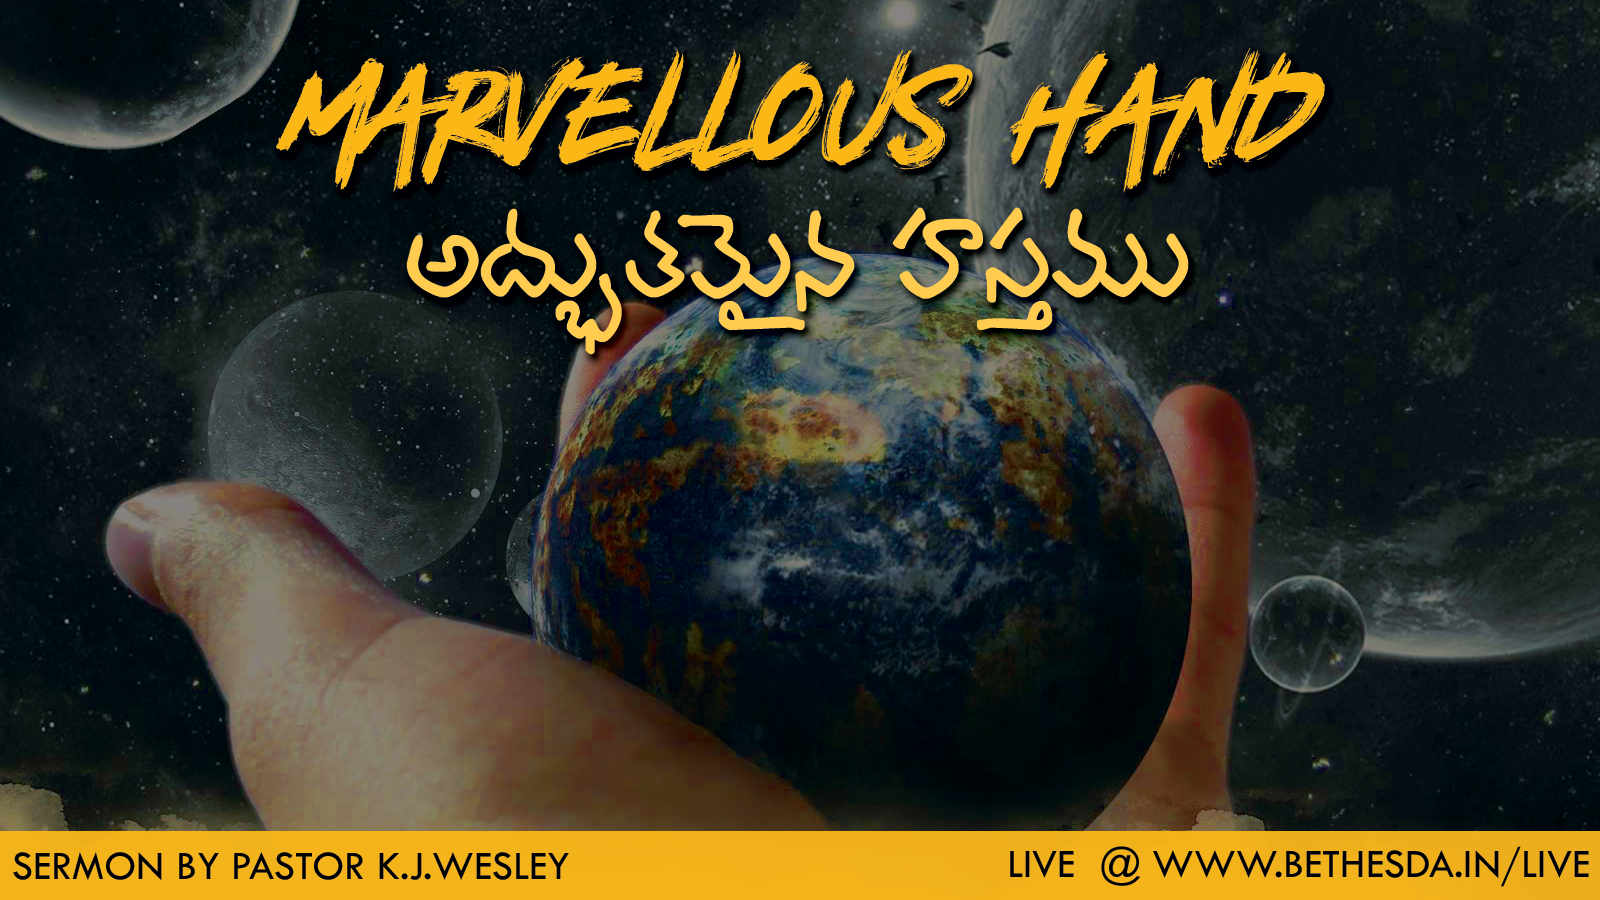 Marvellous Hand (A327)